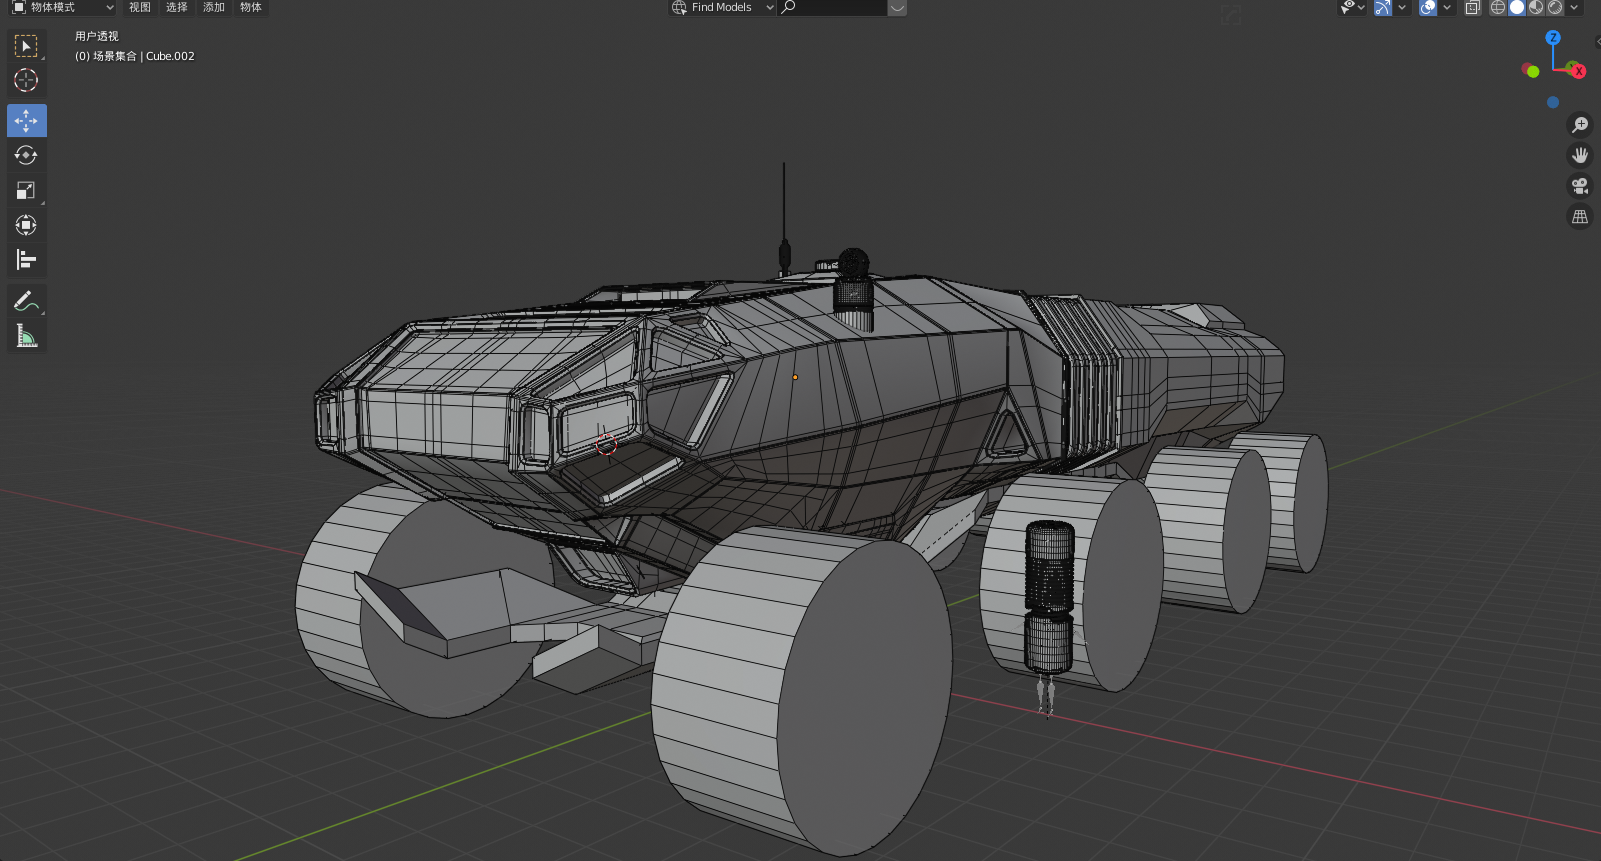 Space Rover Challange - survival